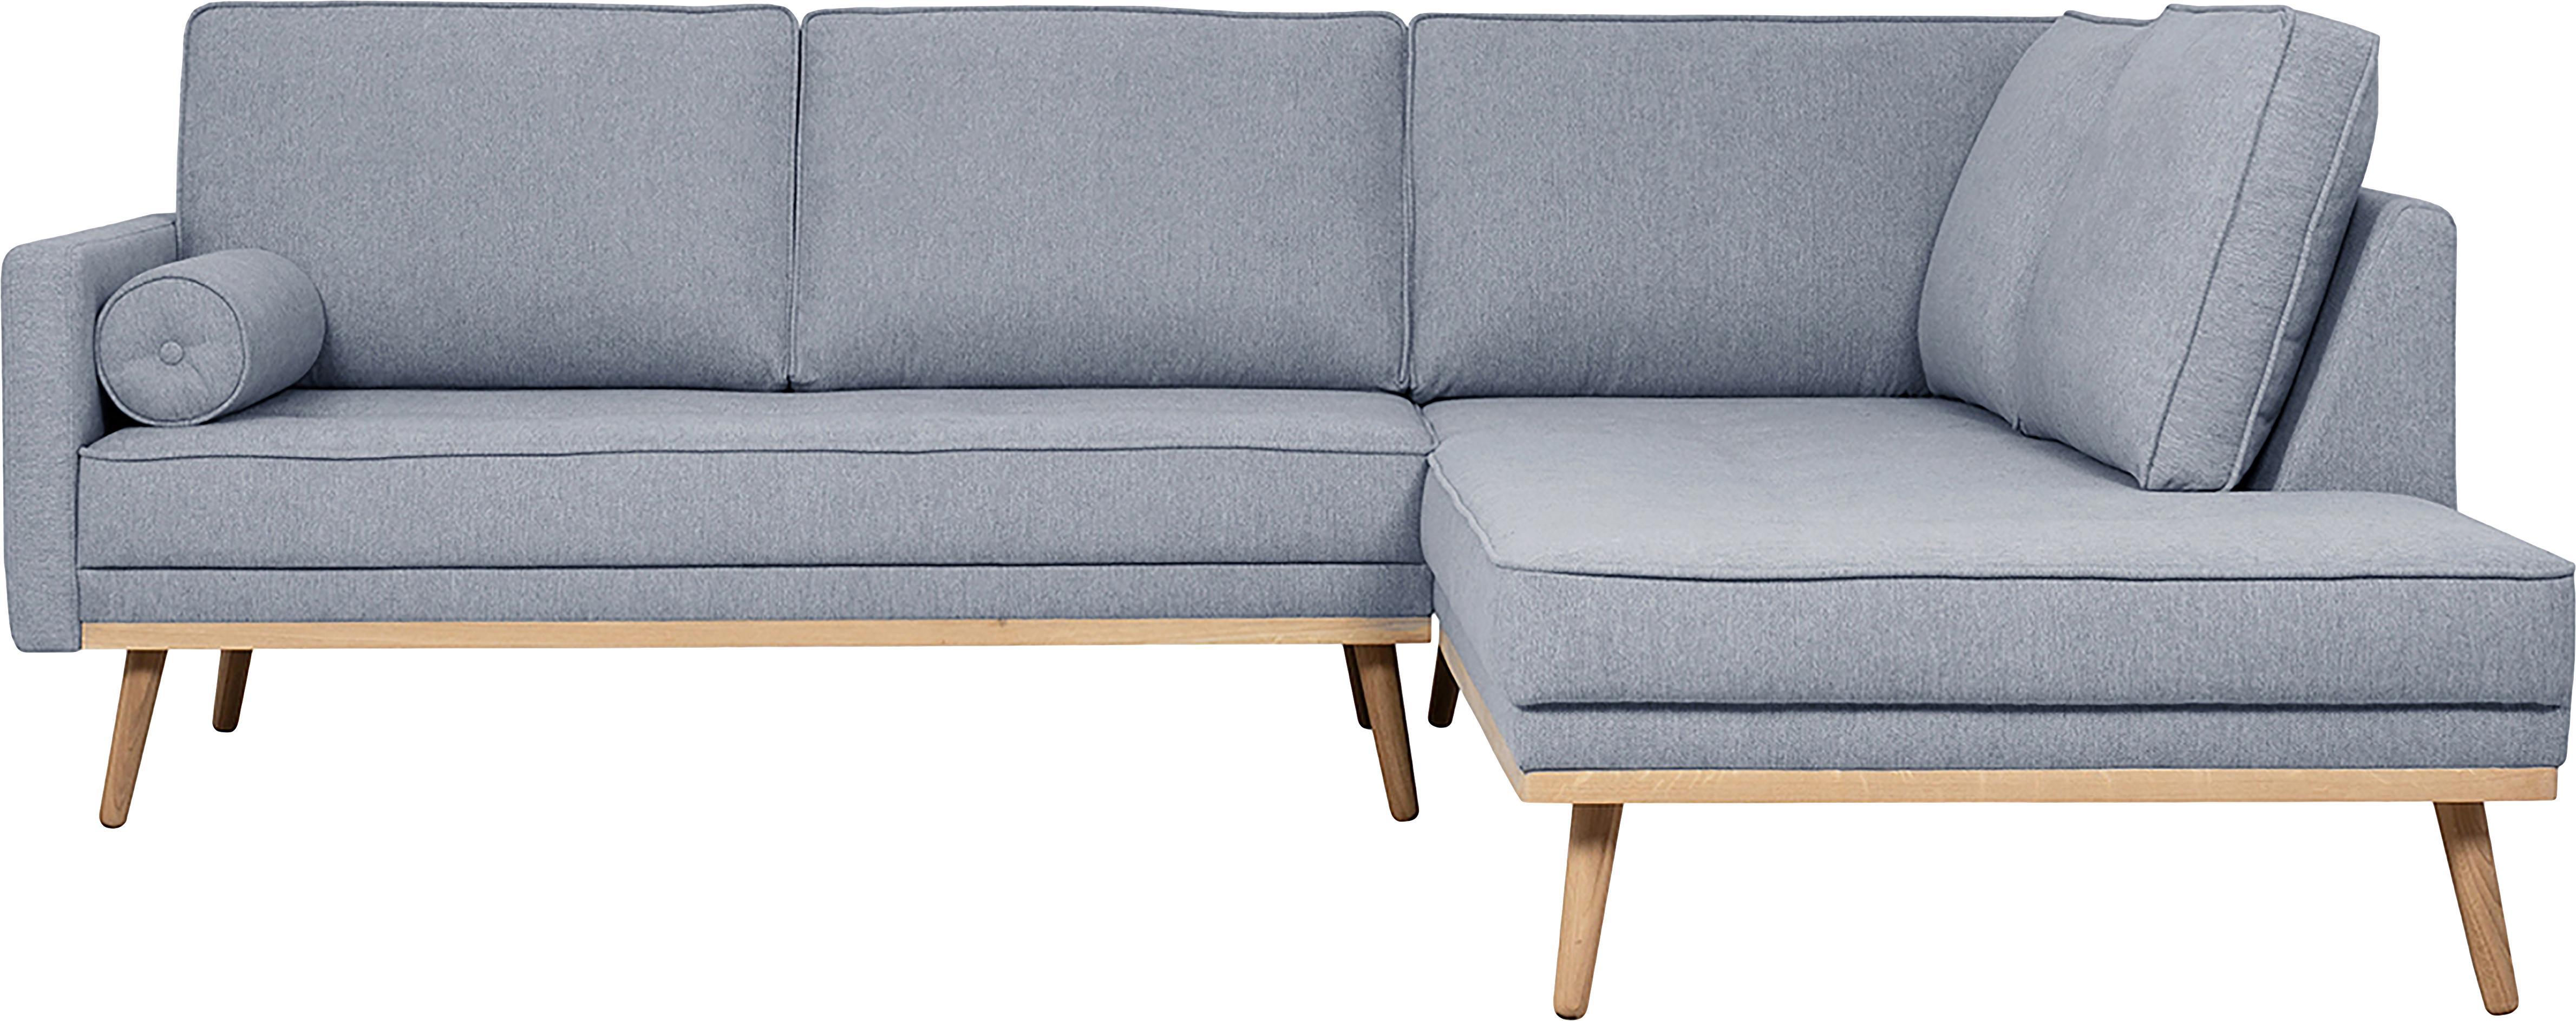 Ecksofa Saint (3-Sitzer), Bezug: Polyester Der hochwertige, Gestell: Massives Kiefernholz, Spa, Webstoff Blaugrau, 243 x 70 cm